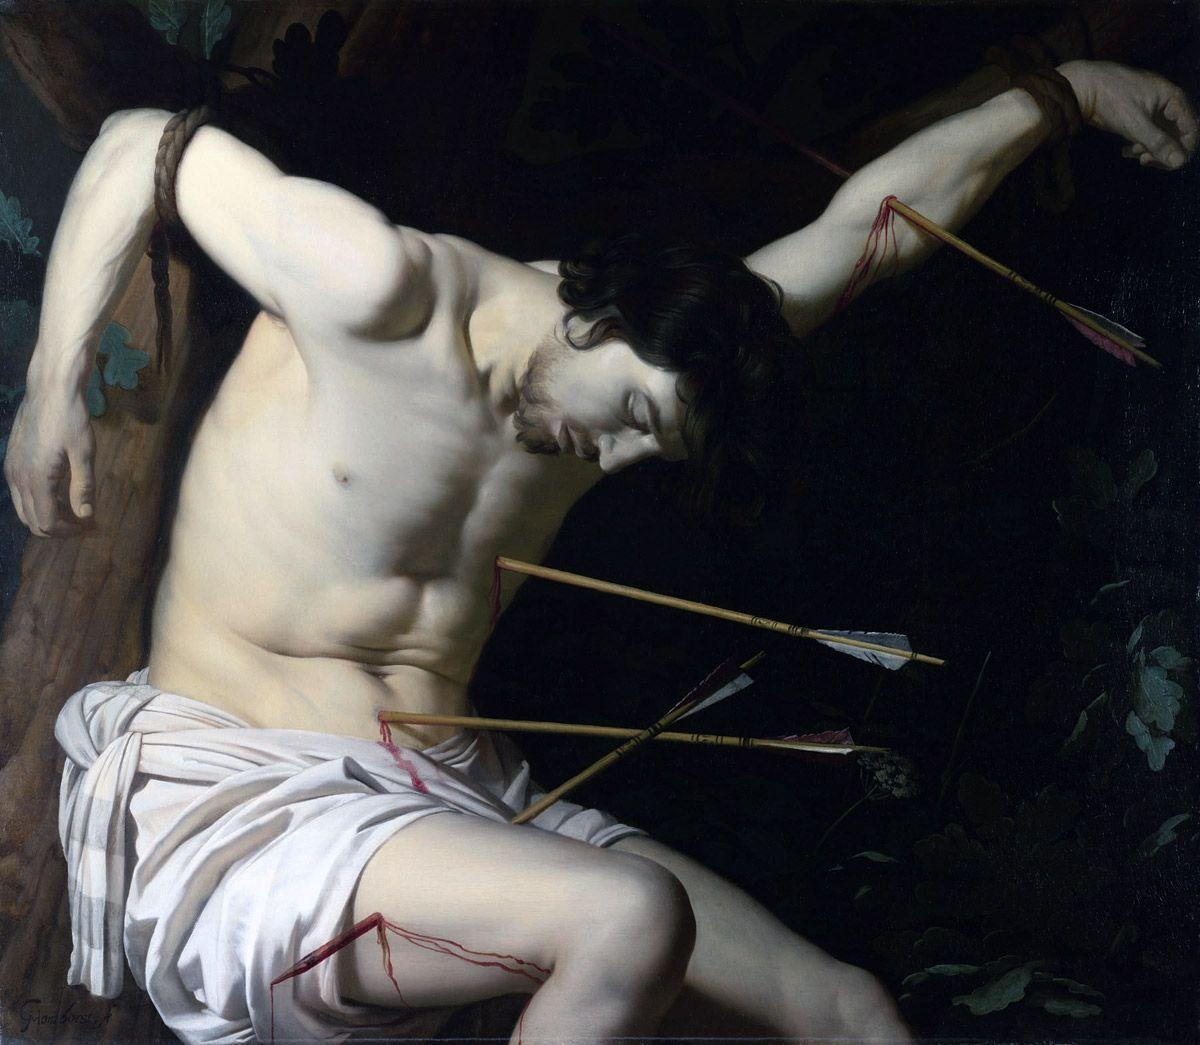 Gerrit van Honthorst (NL, 1592-1656) St Sebastian 1623 Oil on canvas National Gallery London